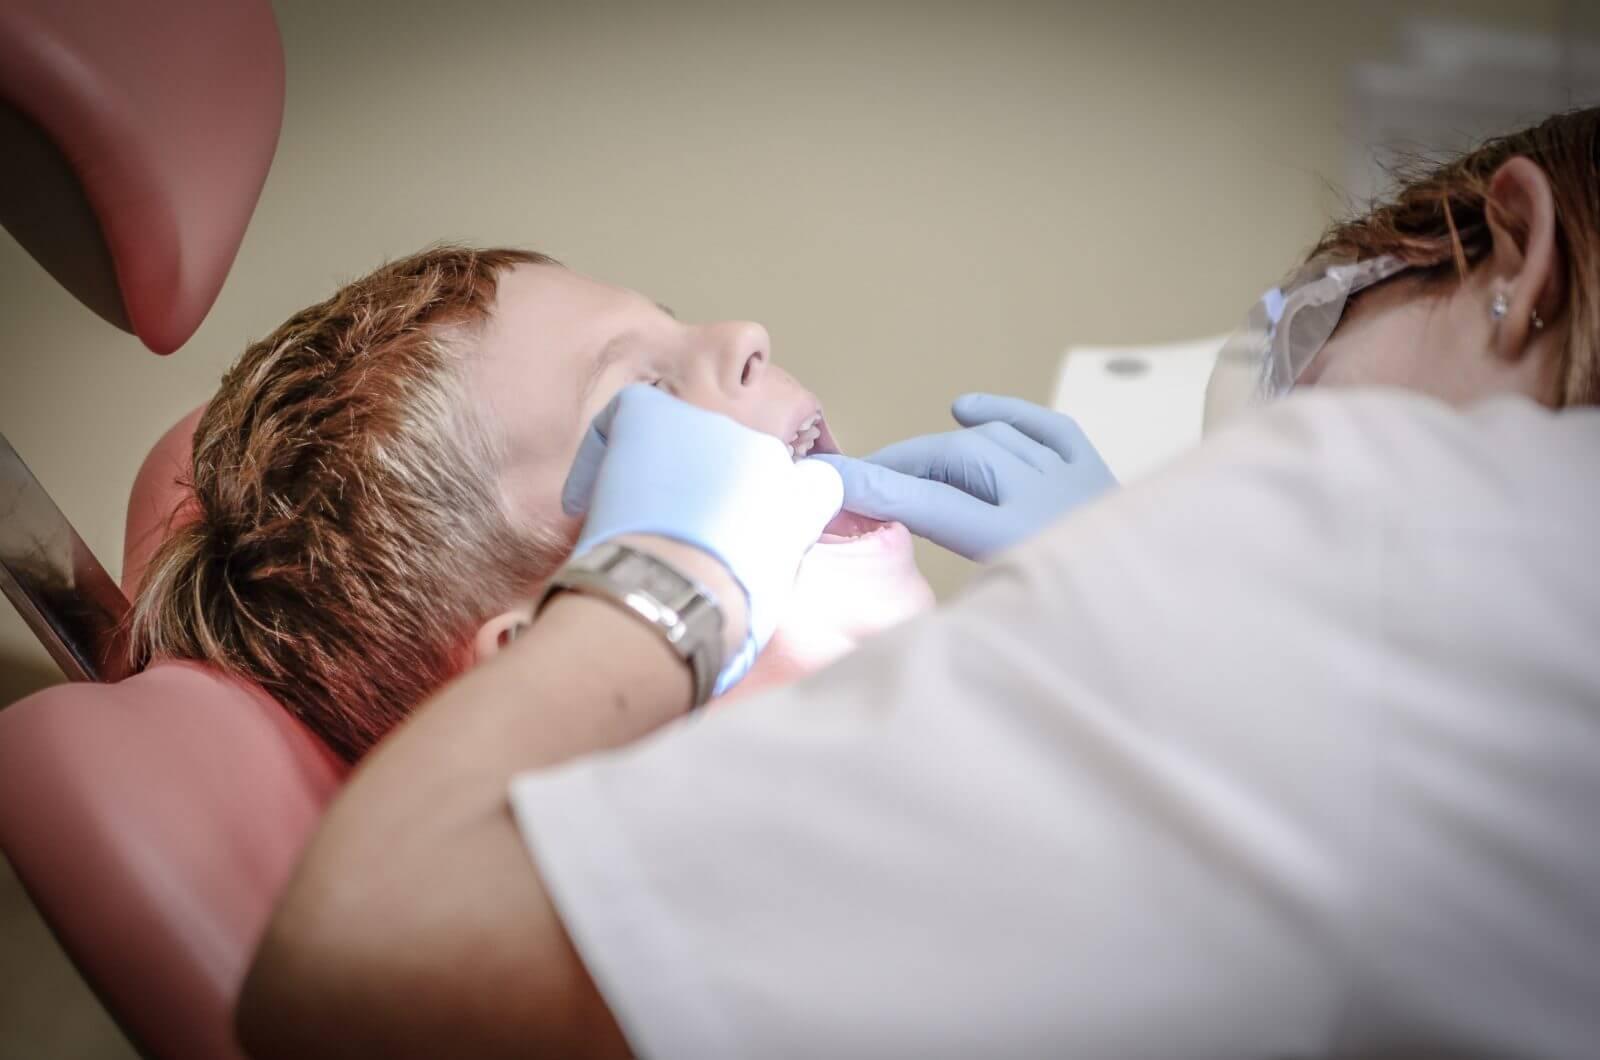 dentist examining a boy